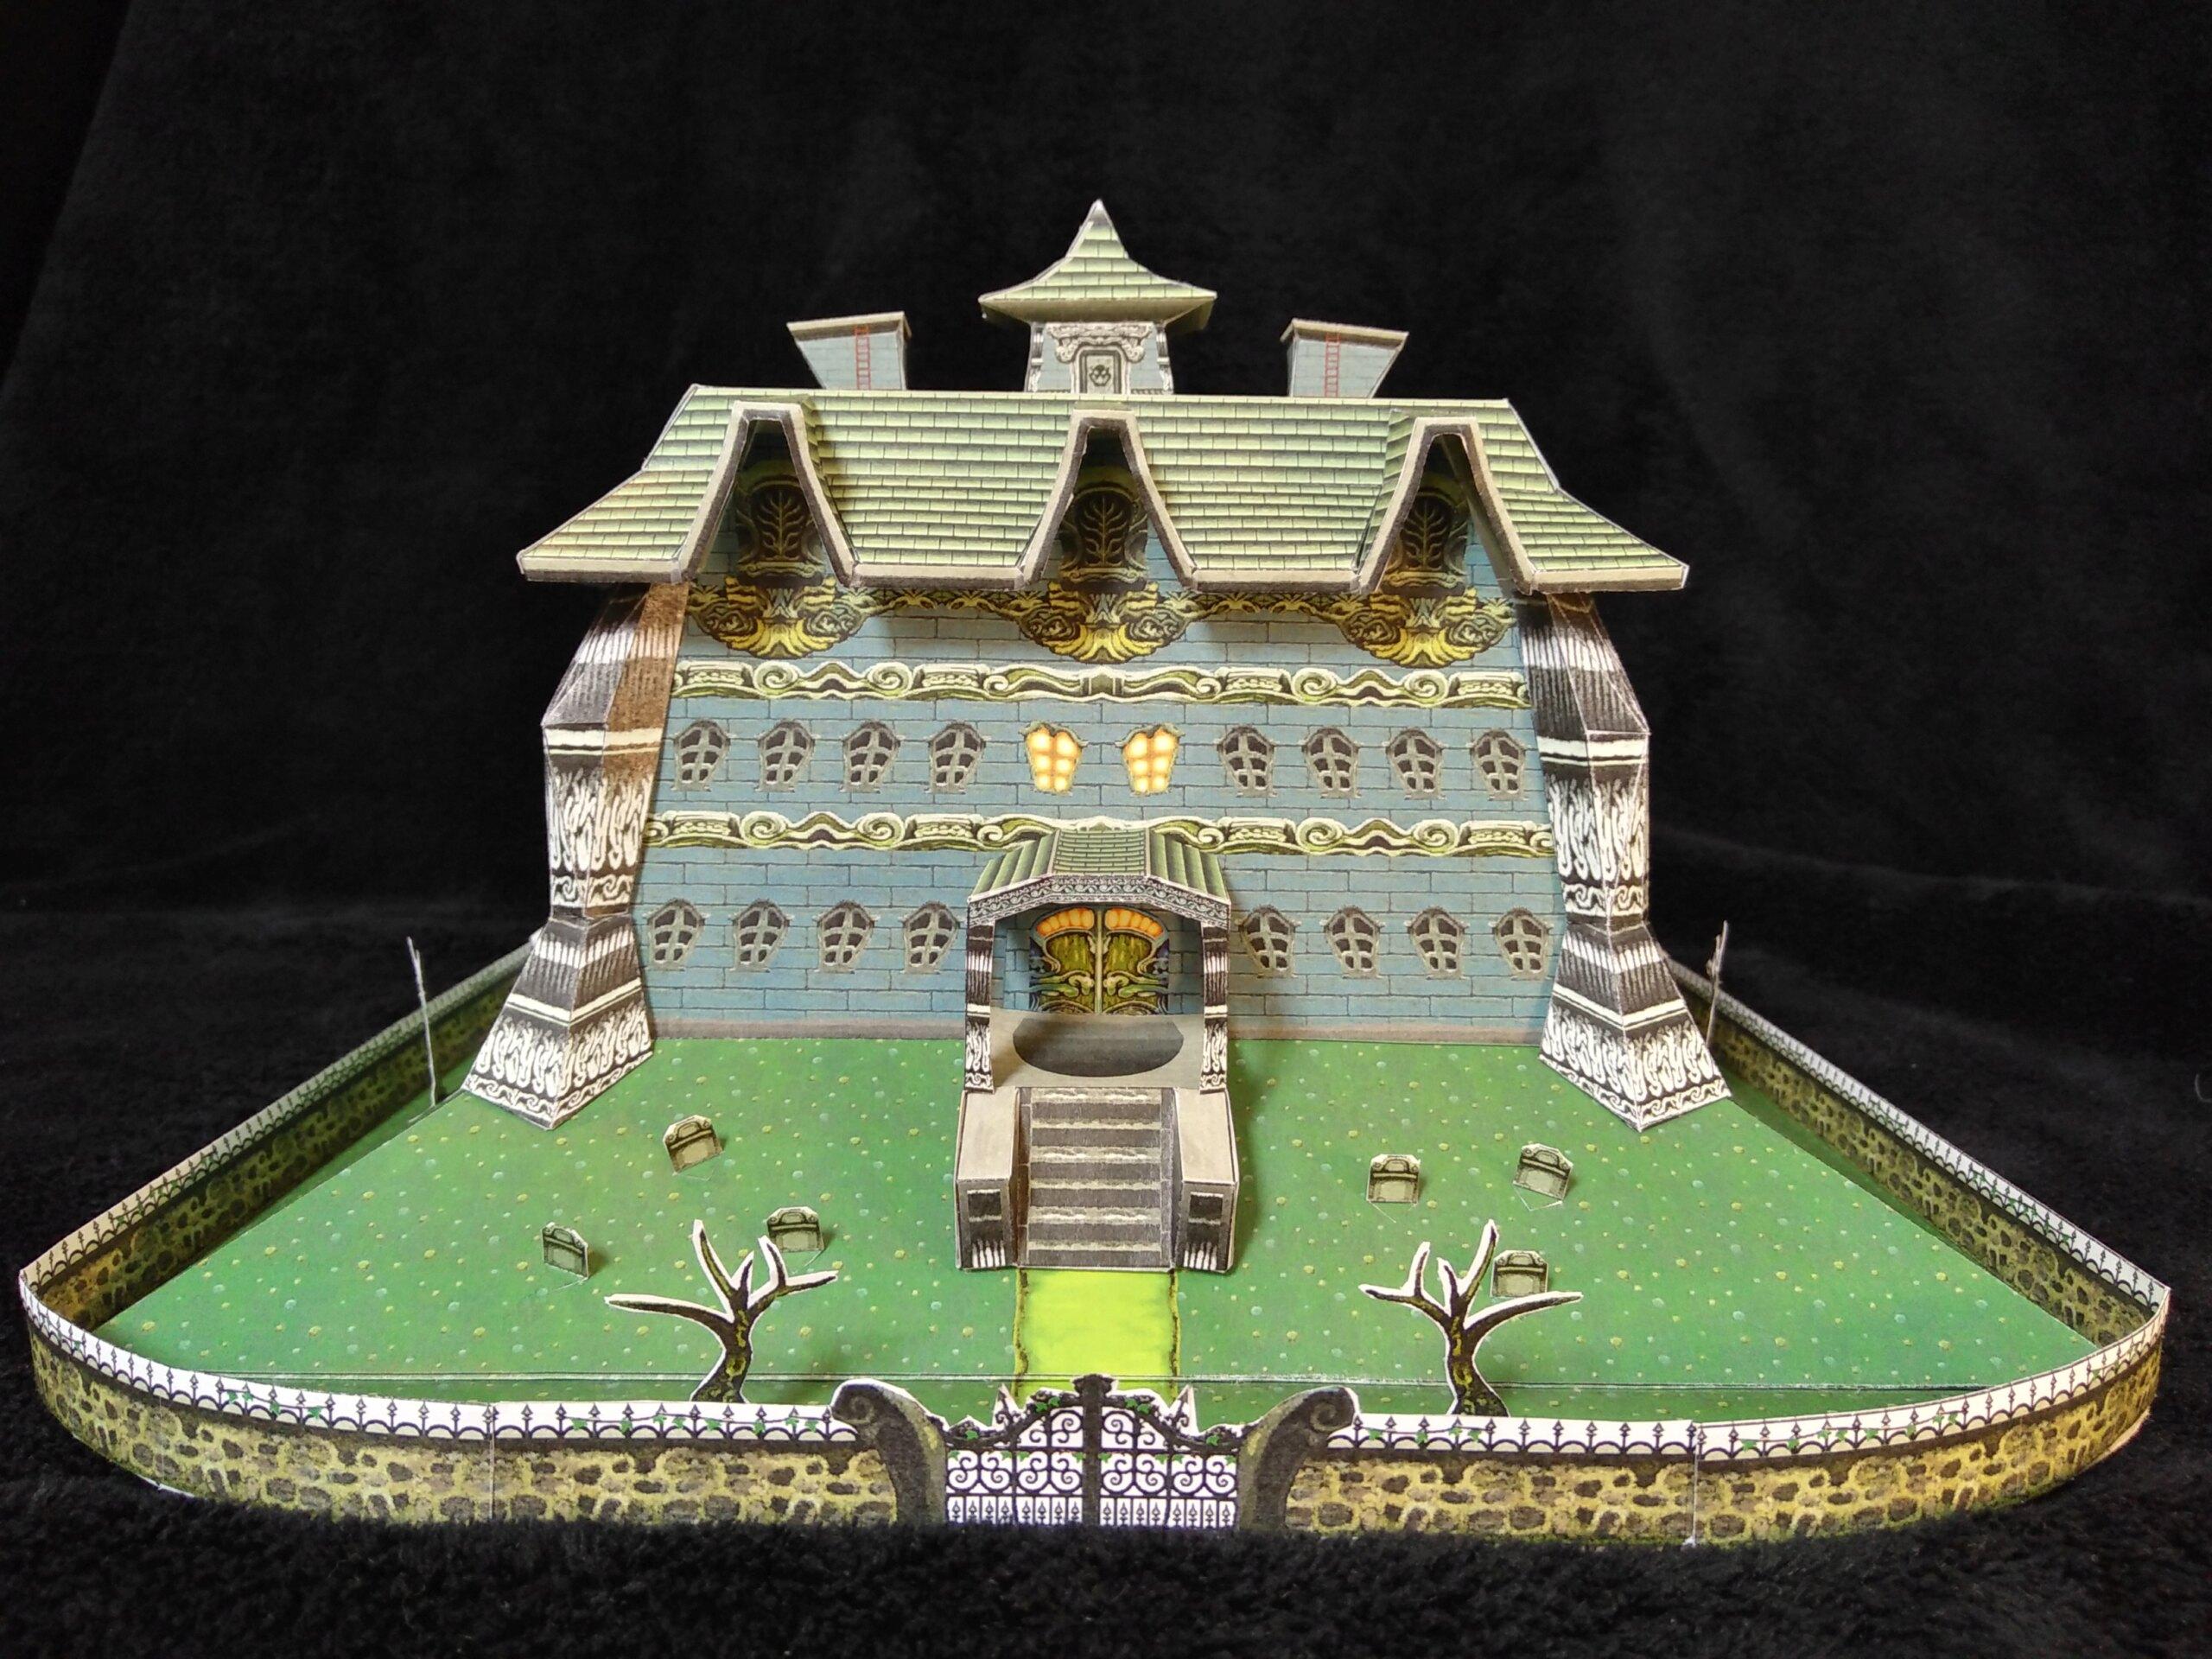 Luigi's Mansion - Die Gruselvilla aus dem Gamecube-Klassiker Img_2018